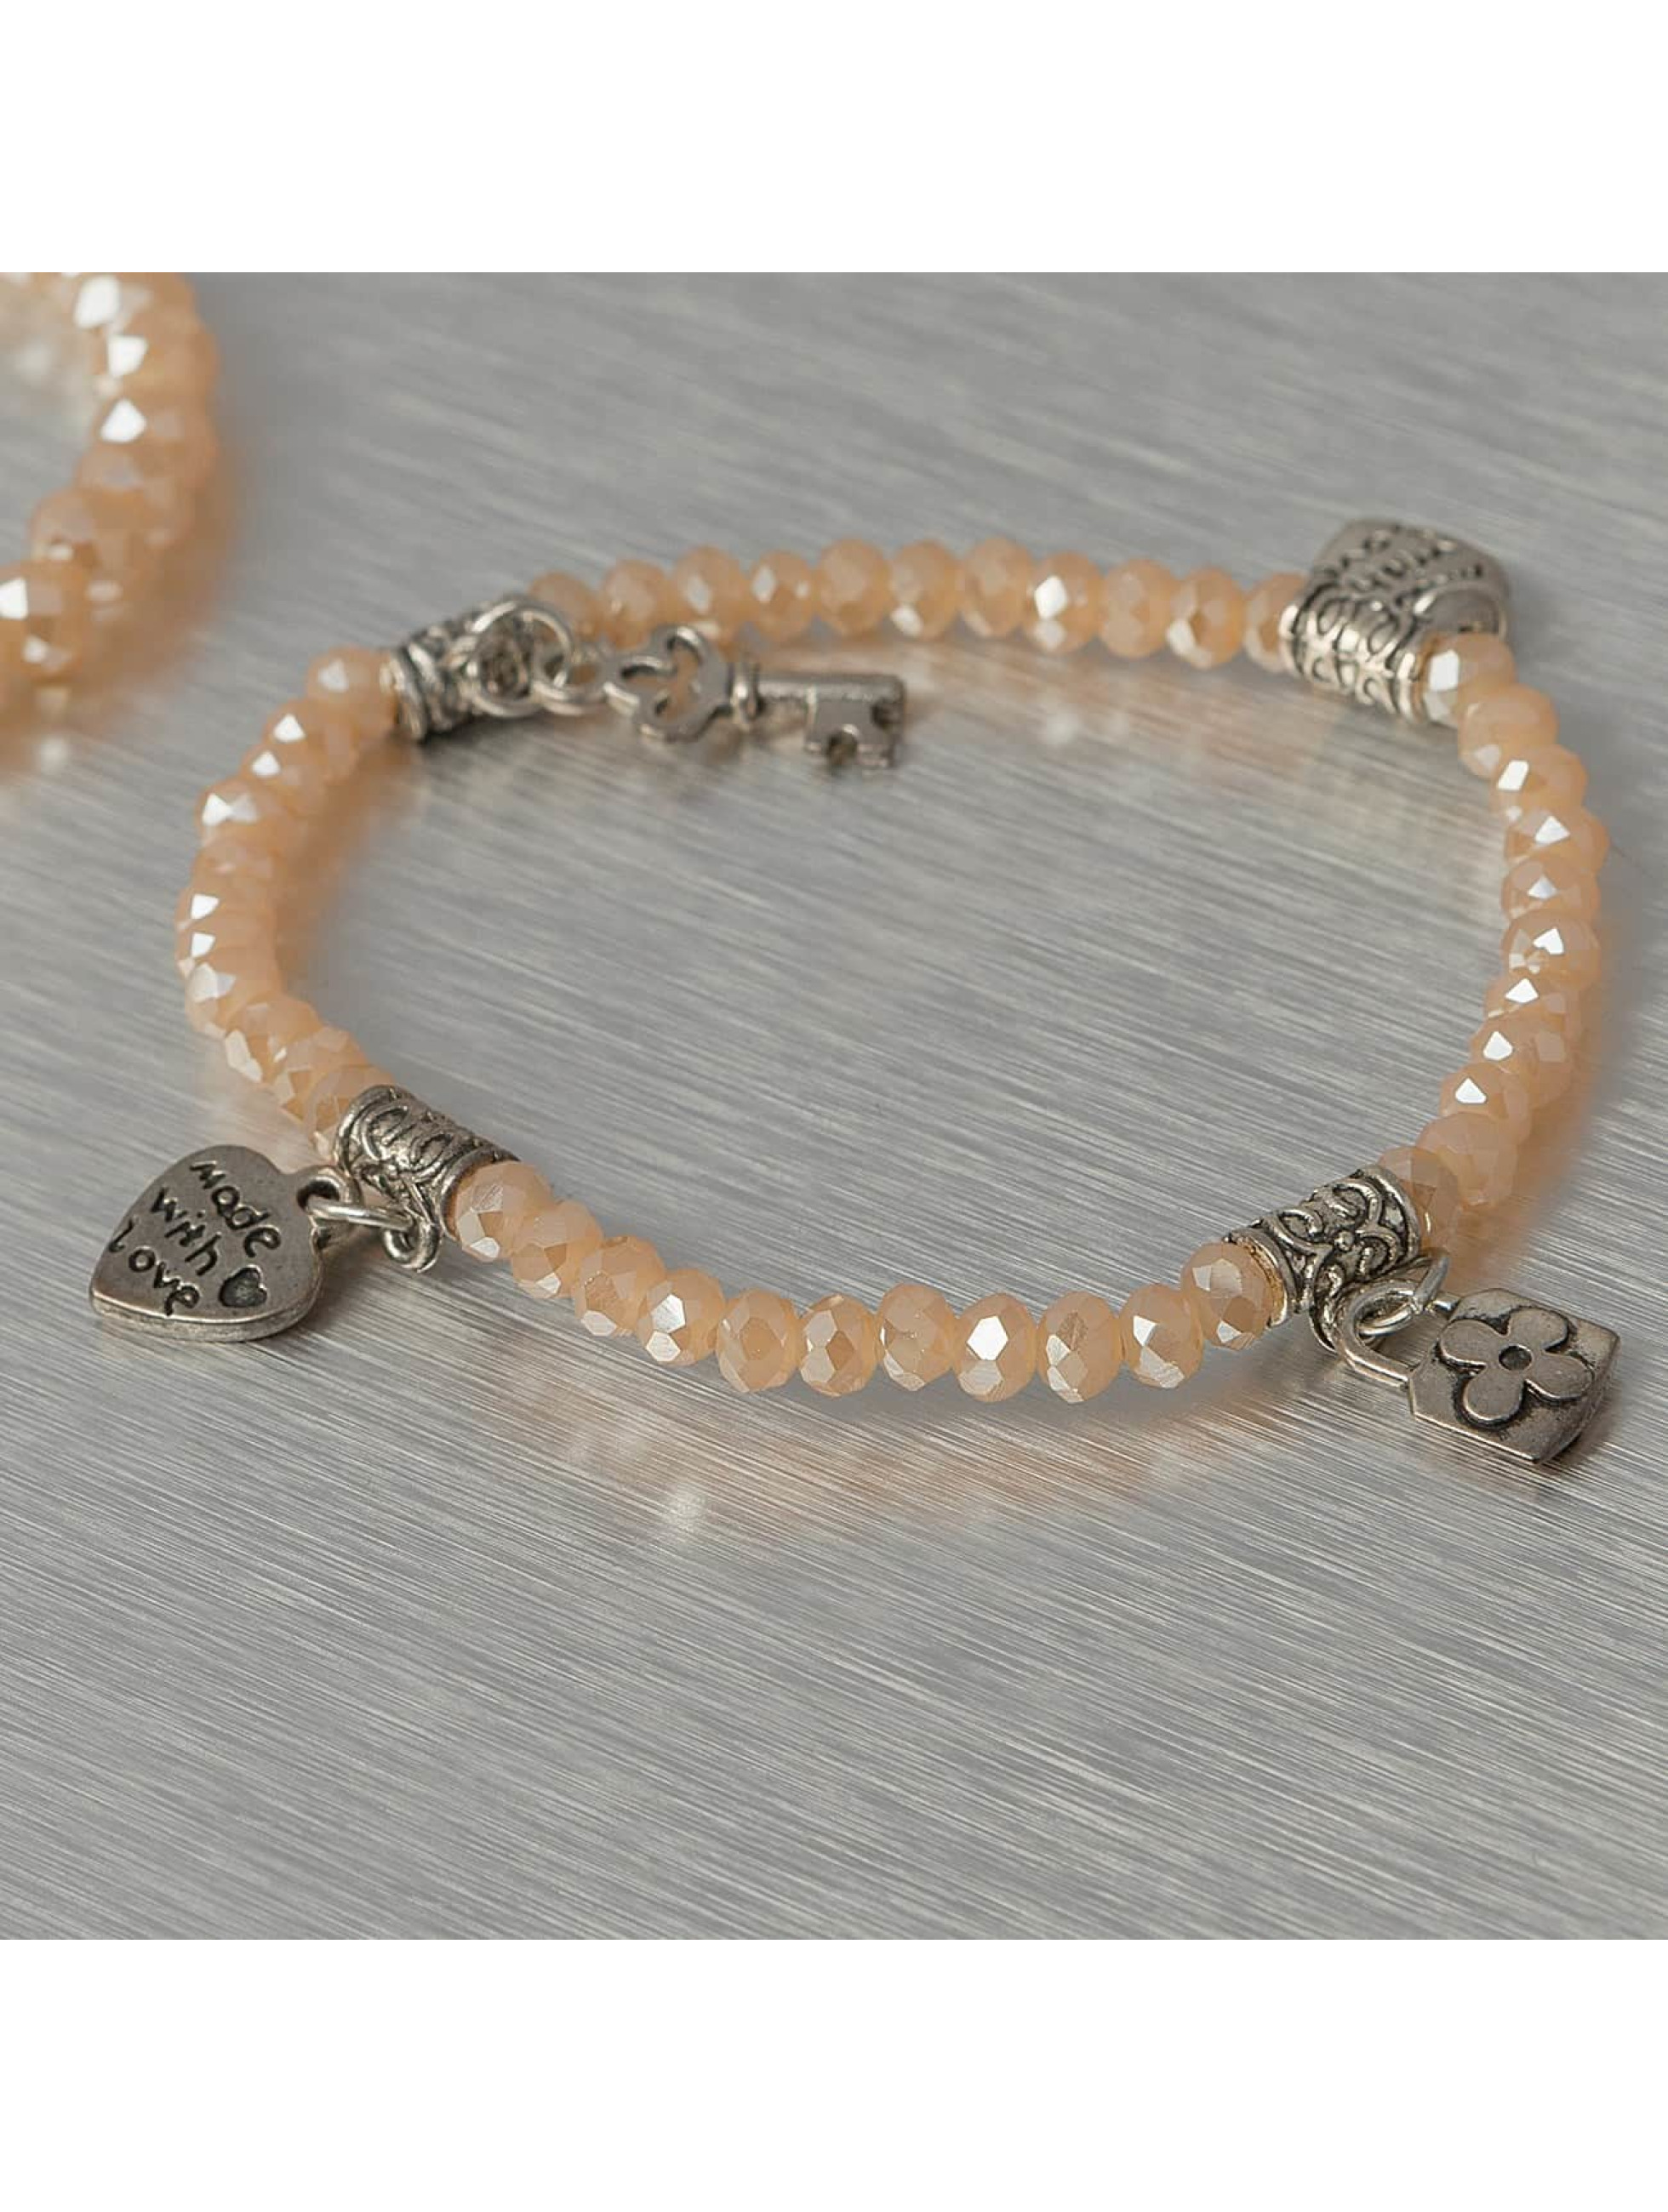 Hailys Bracelet Chrissy brown